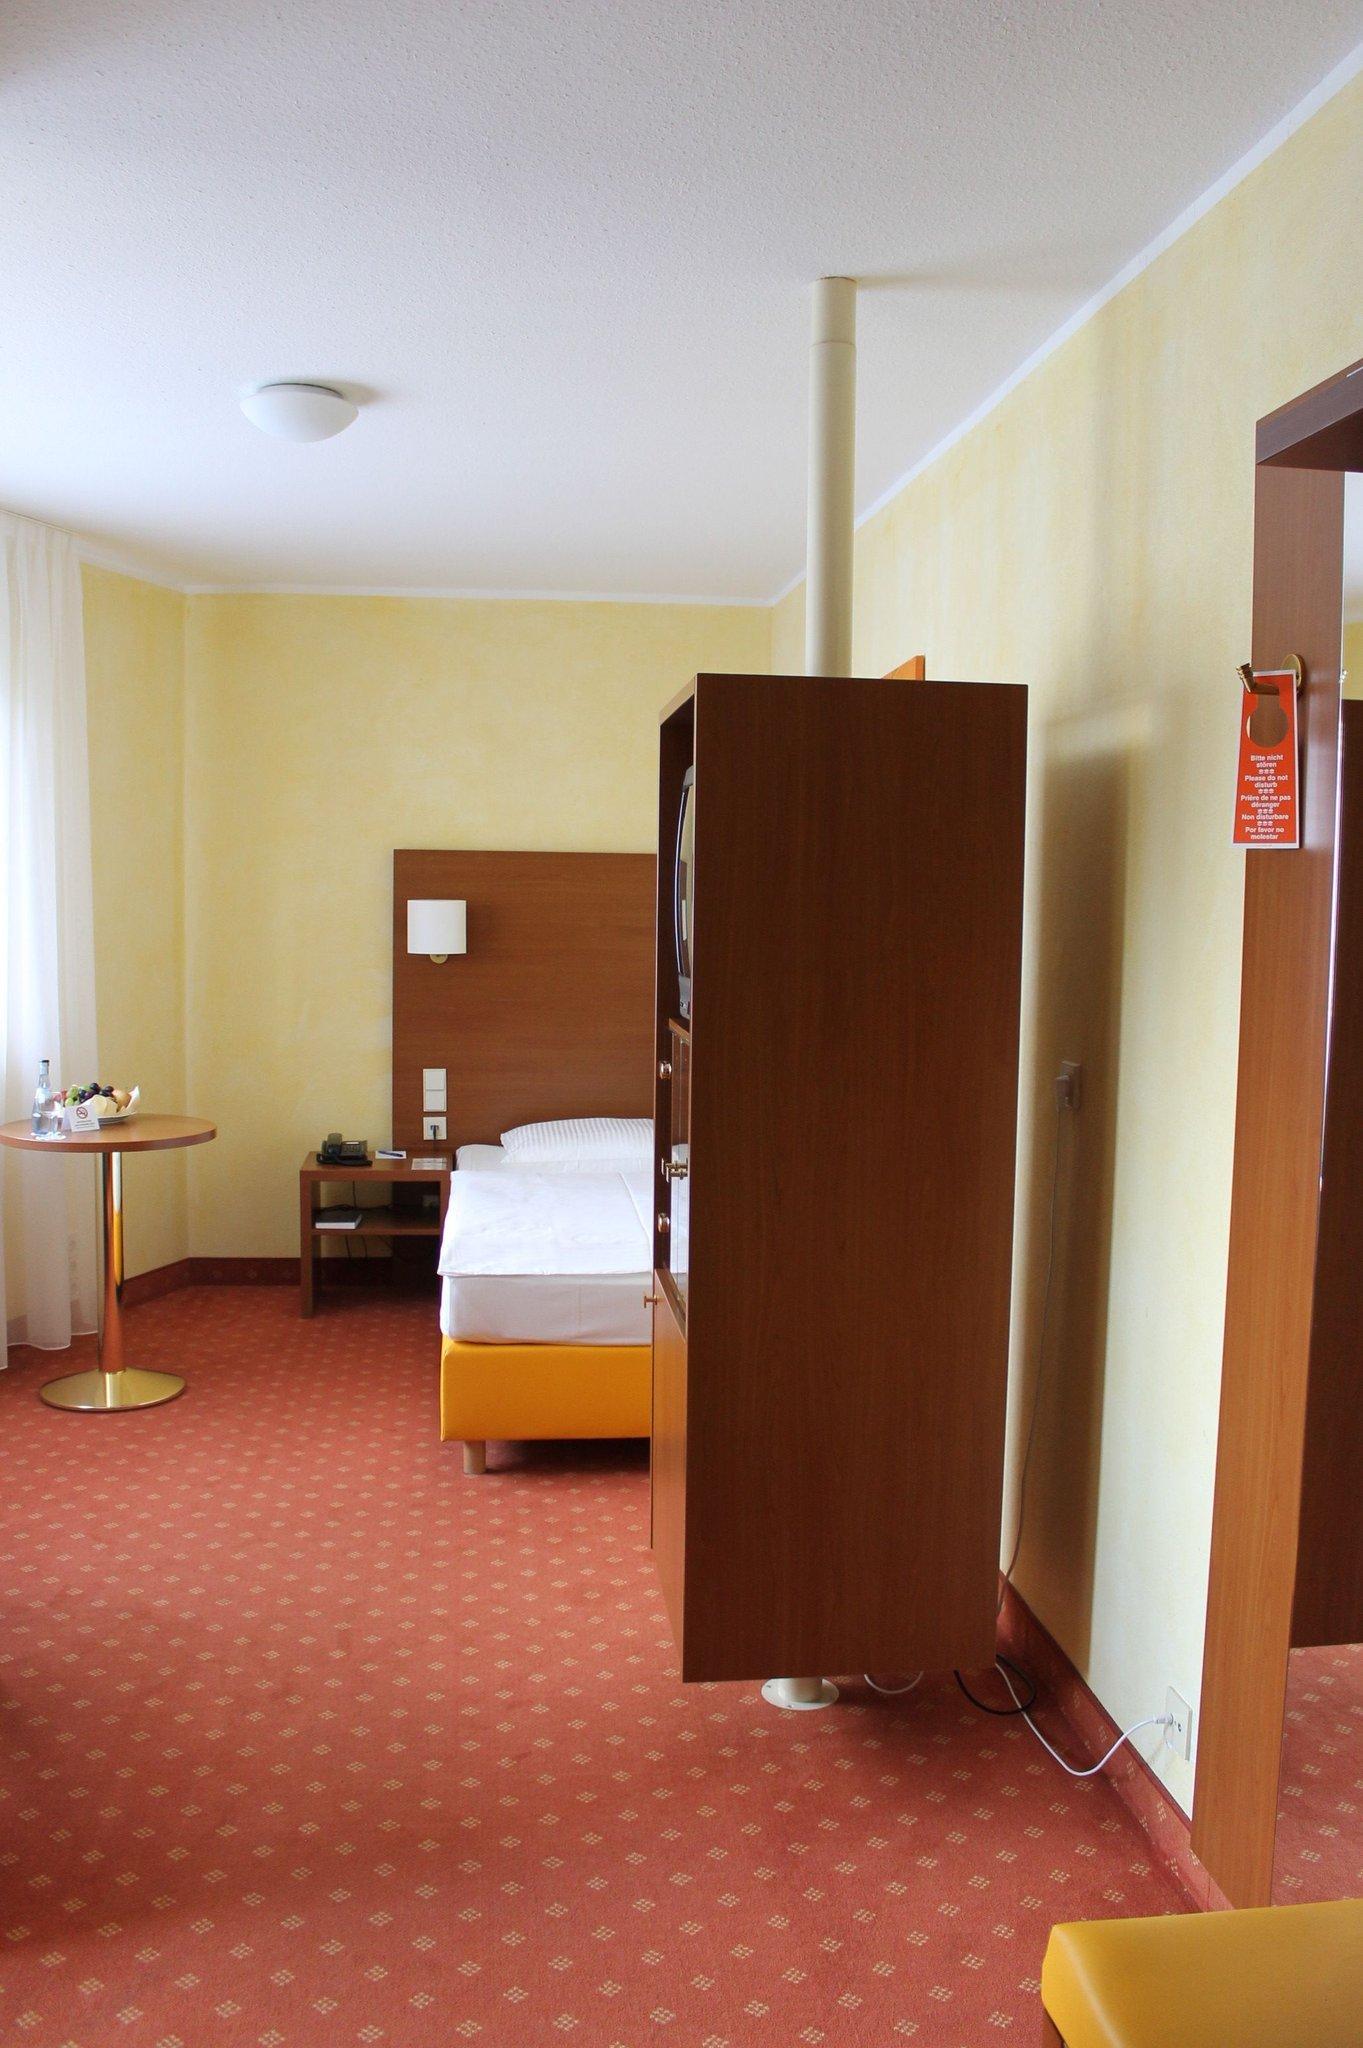 Rega Hotel Stuttgart - UPDATED 2016 Reviews, Pictures & Price ...